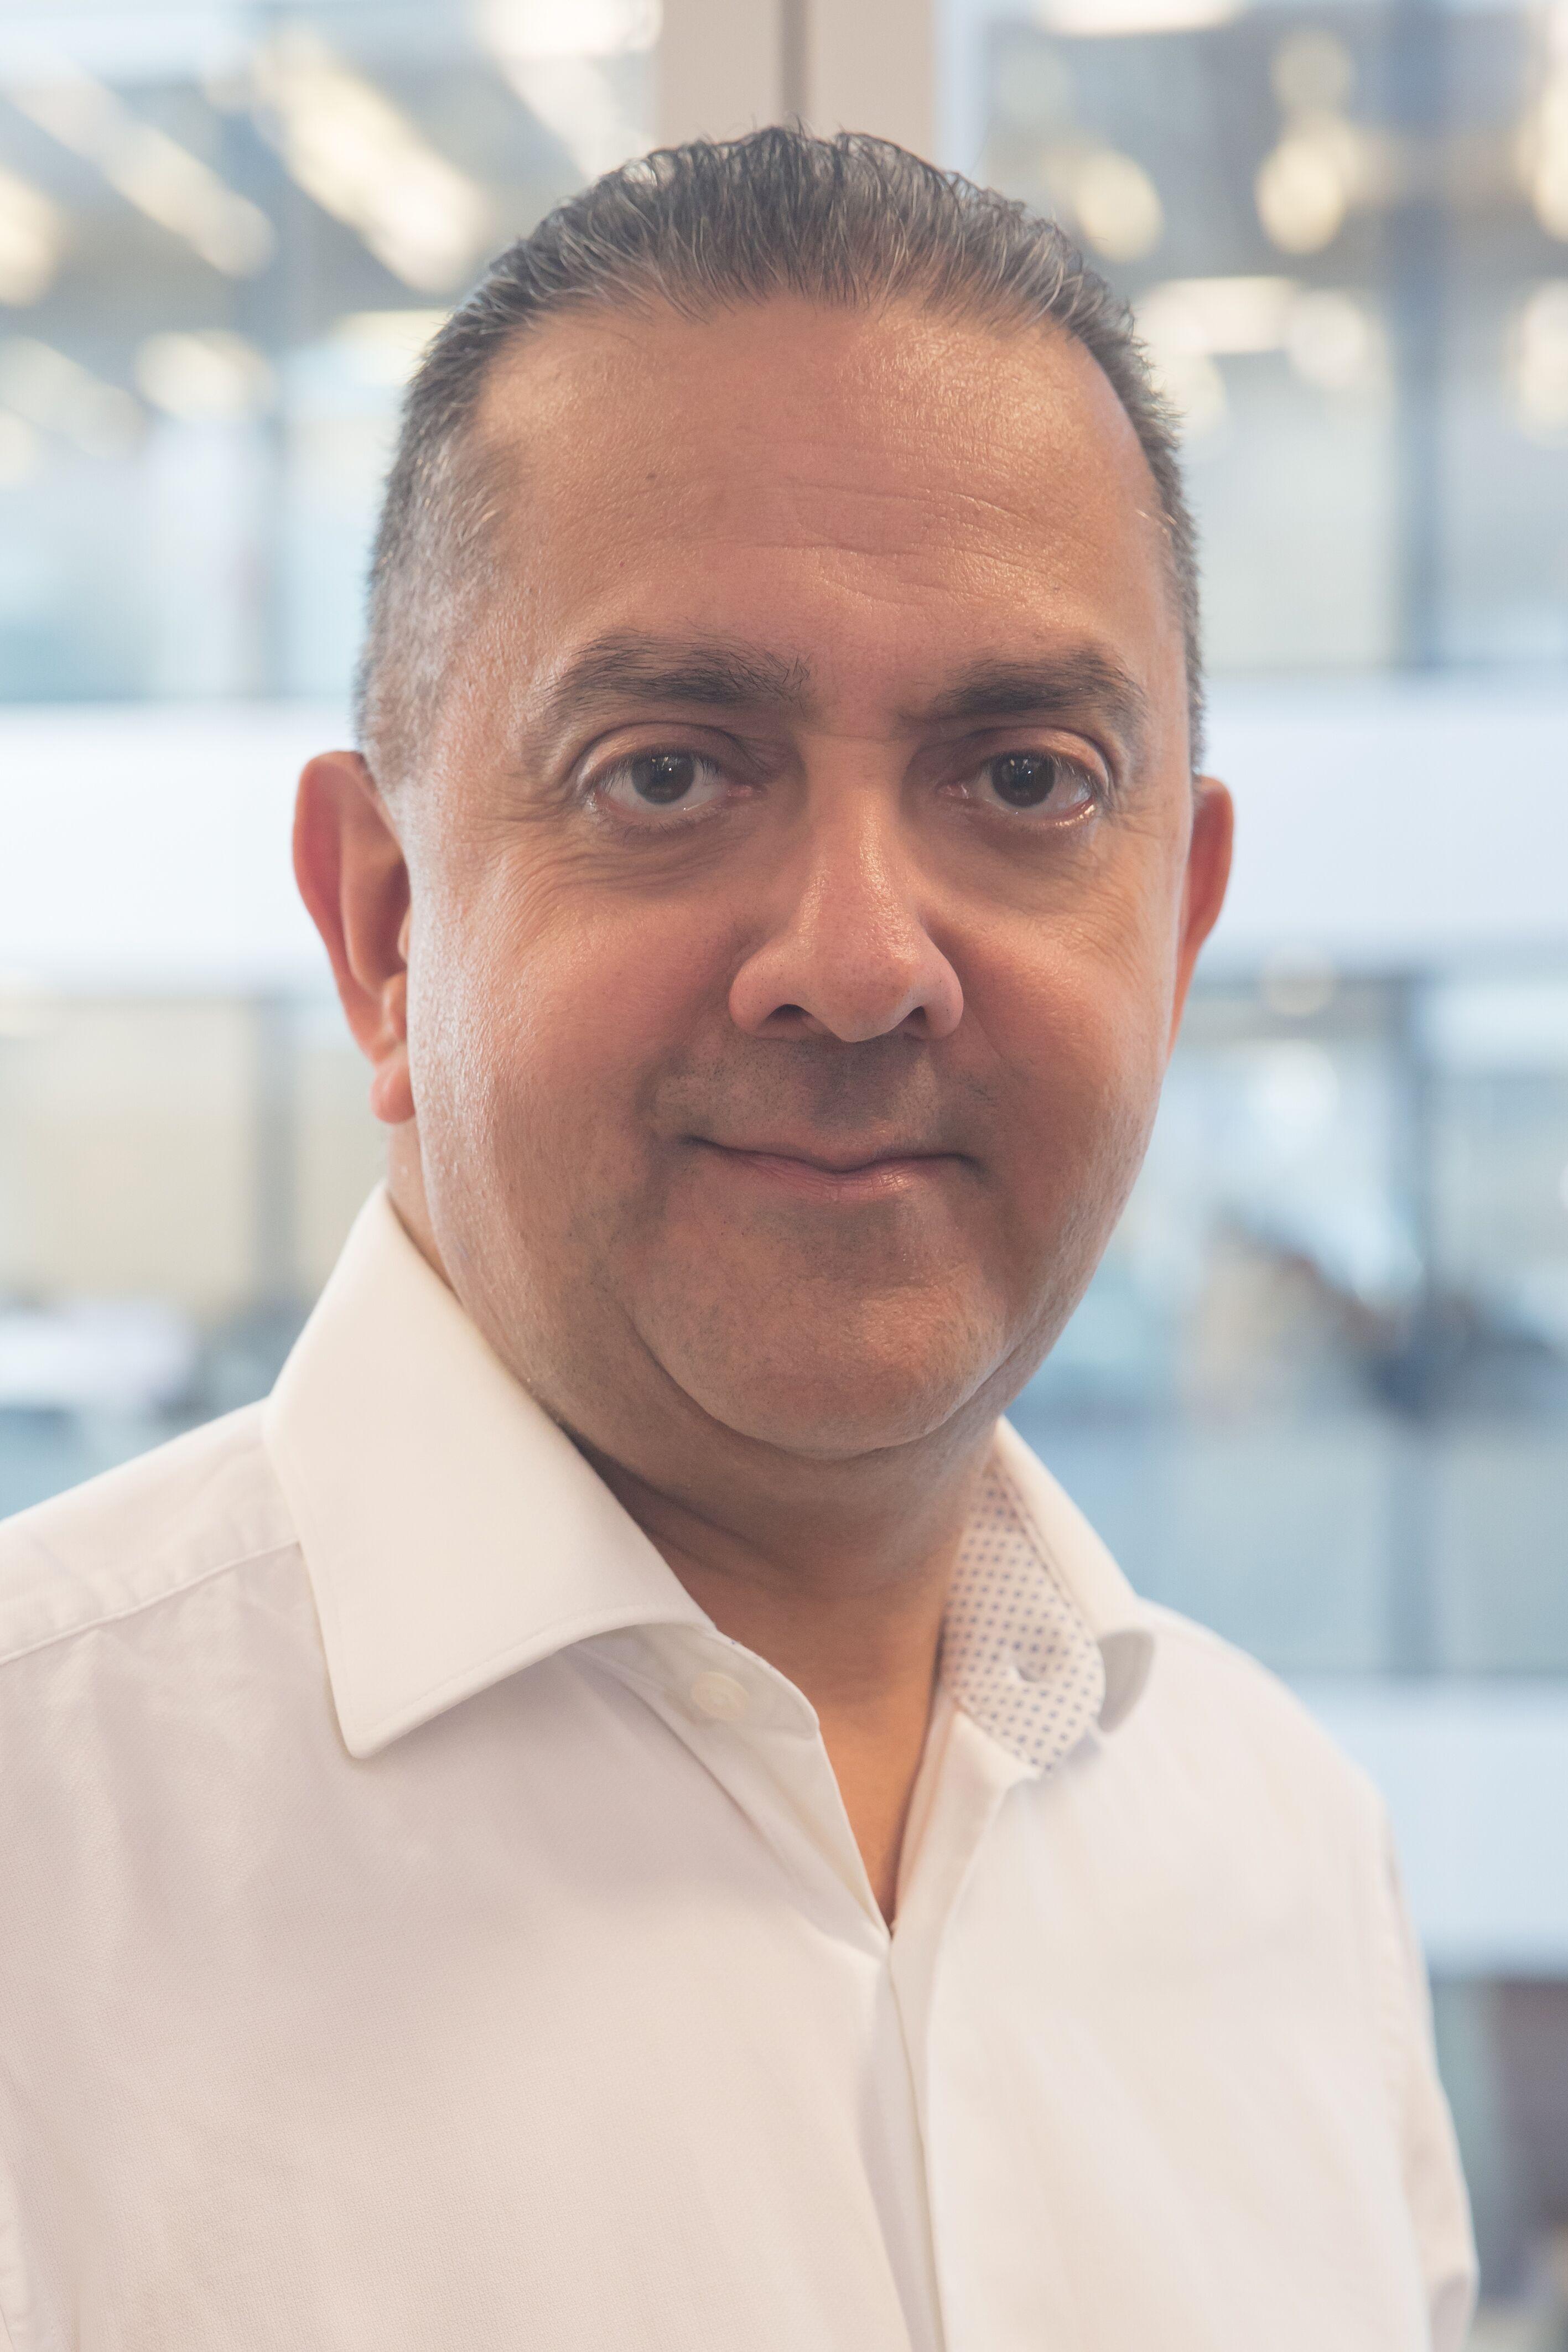 Raj Sitlani, Managing Director of ISAM Capital Markets